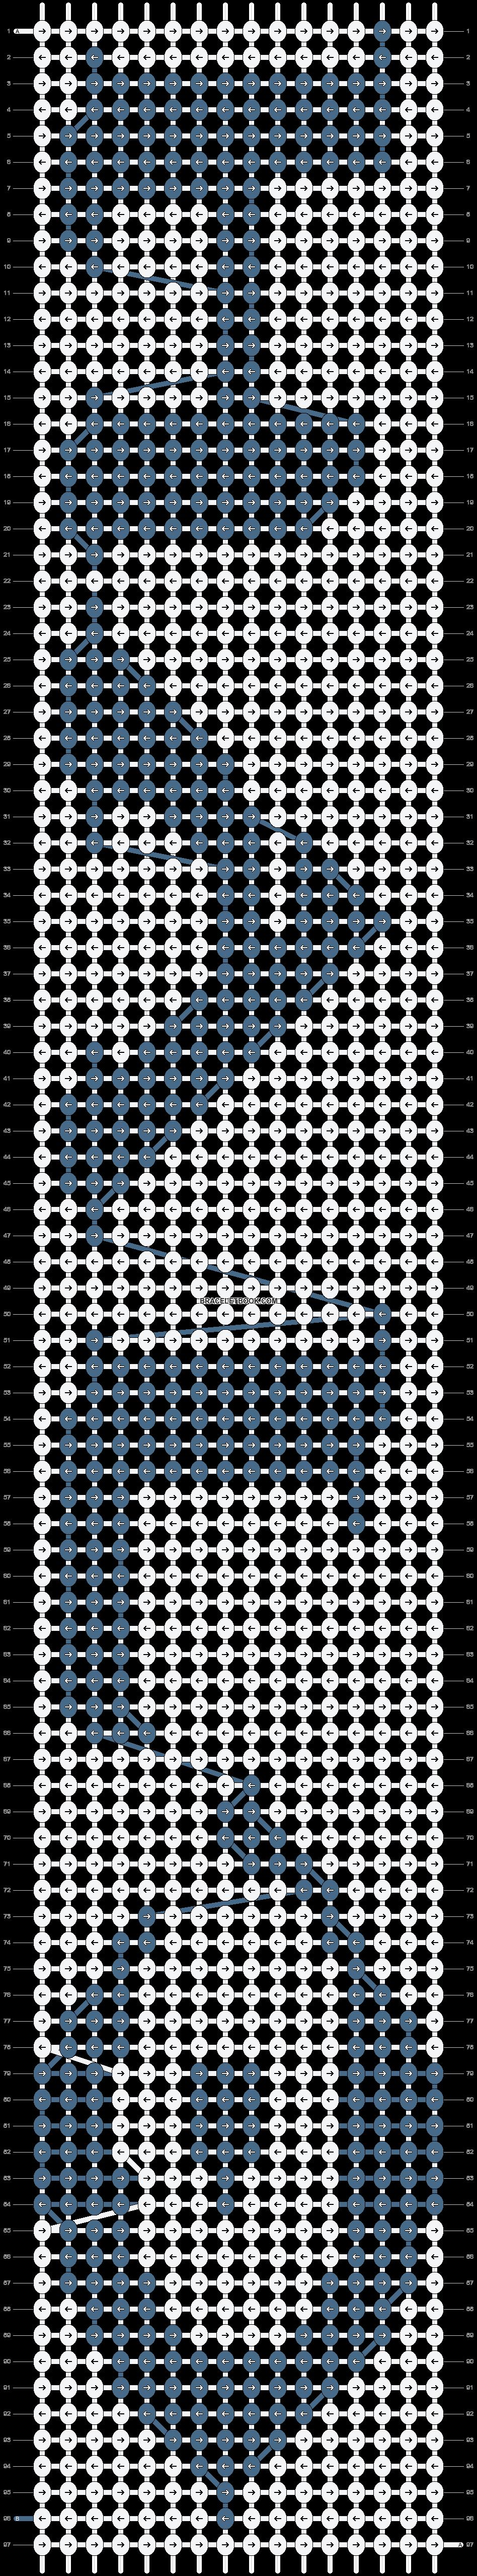 Alpha pattern #2576 pattern